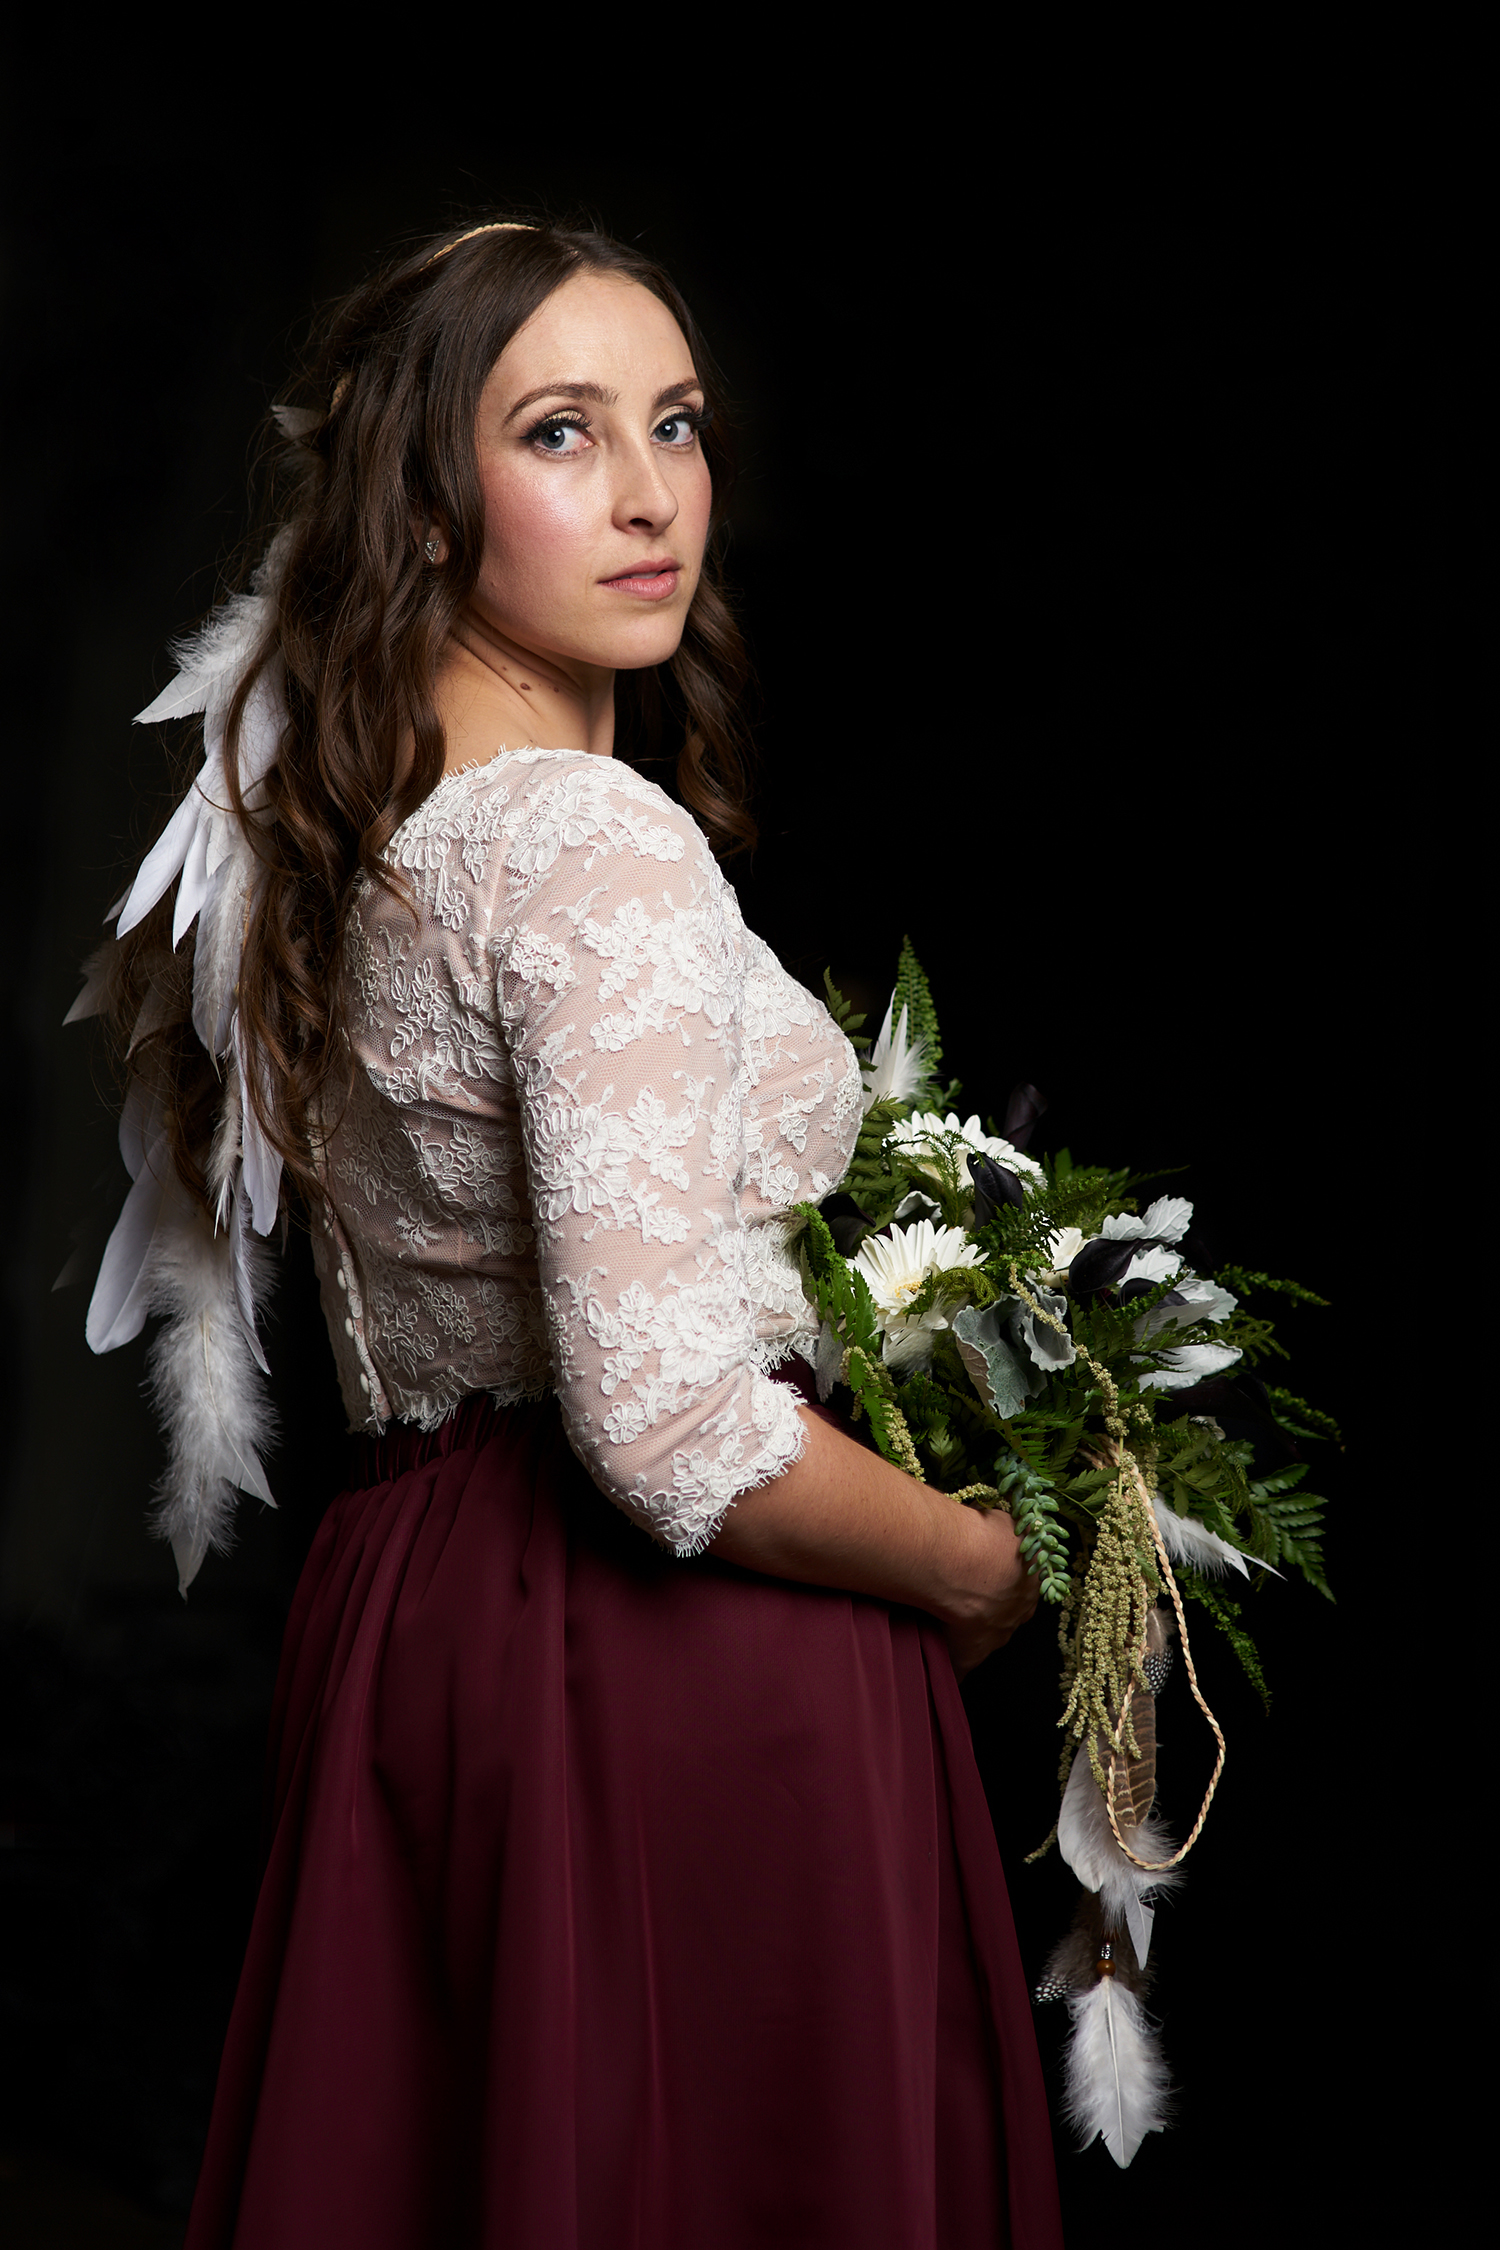 100717_Lenora_Jesse0761-weddingdress-bride-weddingphotography-best-weddingphotographer-bridal-groom-wedding-engagementring-proposal-brides-diamondring-sonyalpha-sony-sonya7rii-sanfrancisco-sf-bayarea-photographer-profoto-berkeley-botanical-garden.jpg